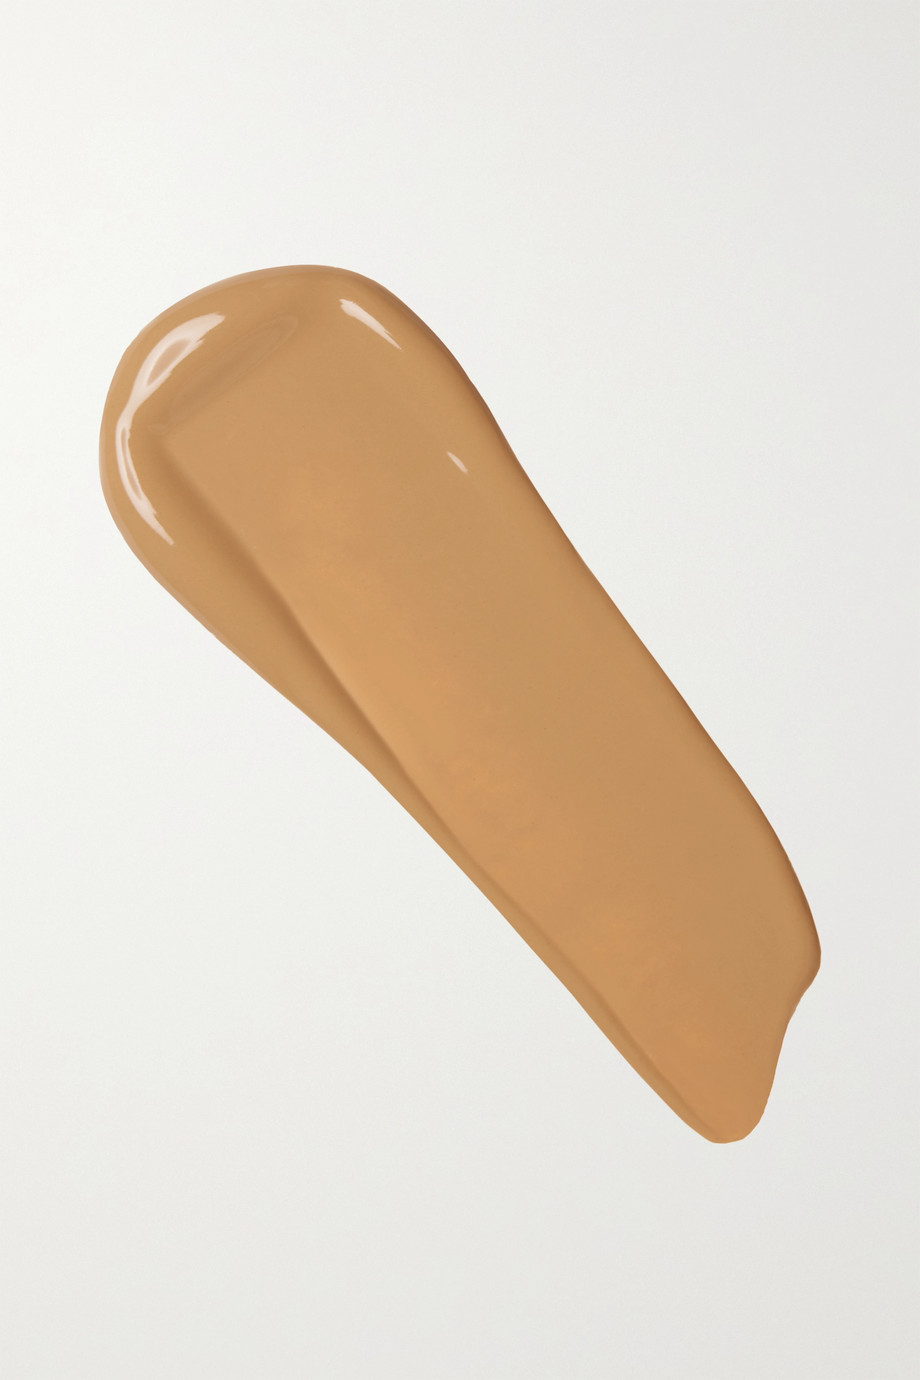 Surratt Beauty Dew Drop Foundation - 11, 19ml